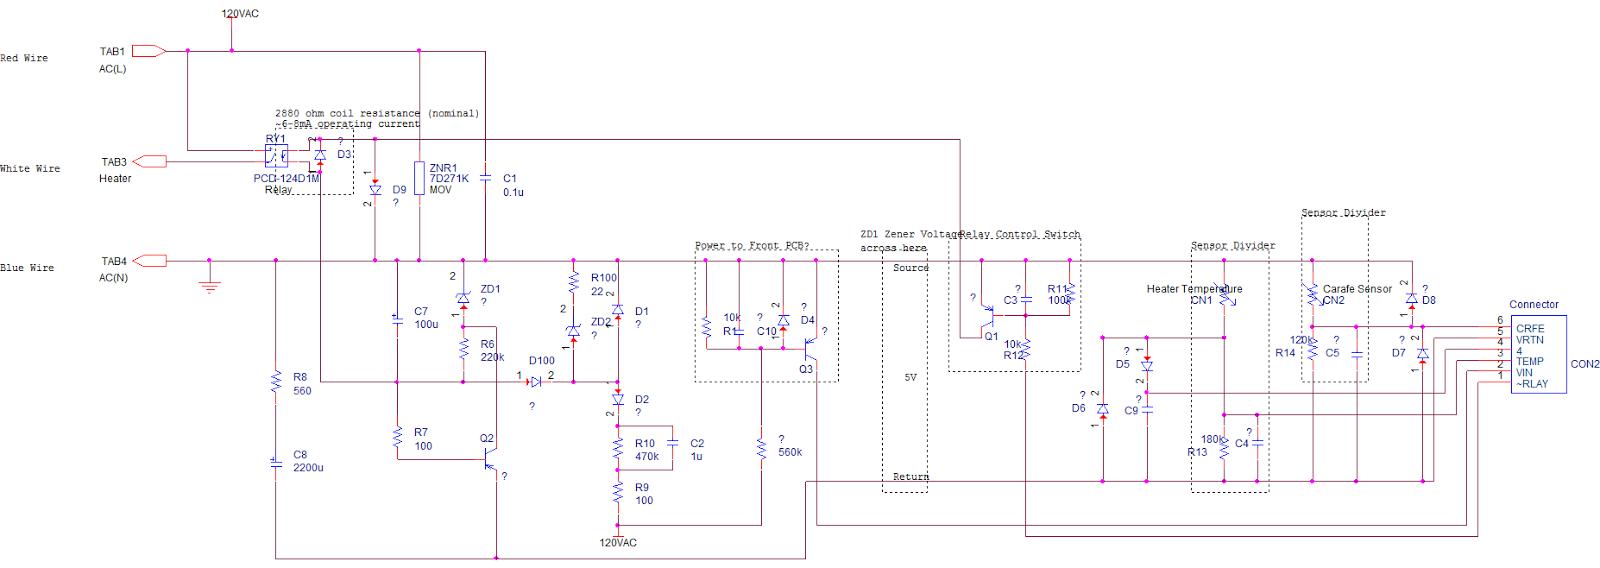 Coffee Pot Wiring Diagram - Wiring Diagrams on